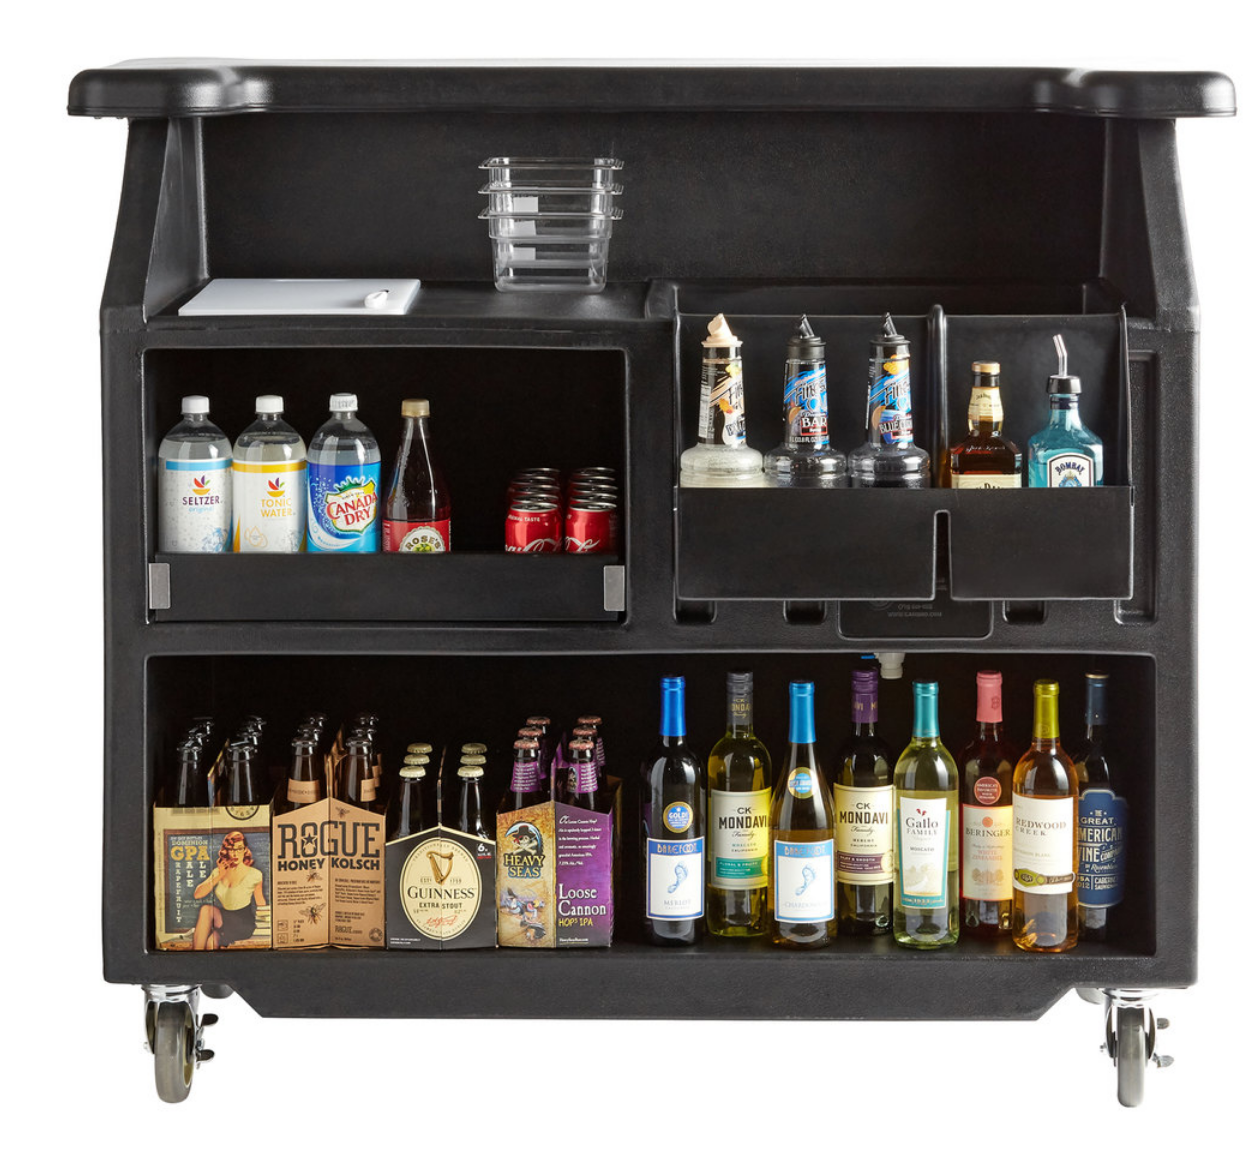 Portable bar rental in Milwaukee, Madison, Appleton, Green Bay, Waukesha, and Muskego Wisconsin